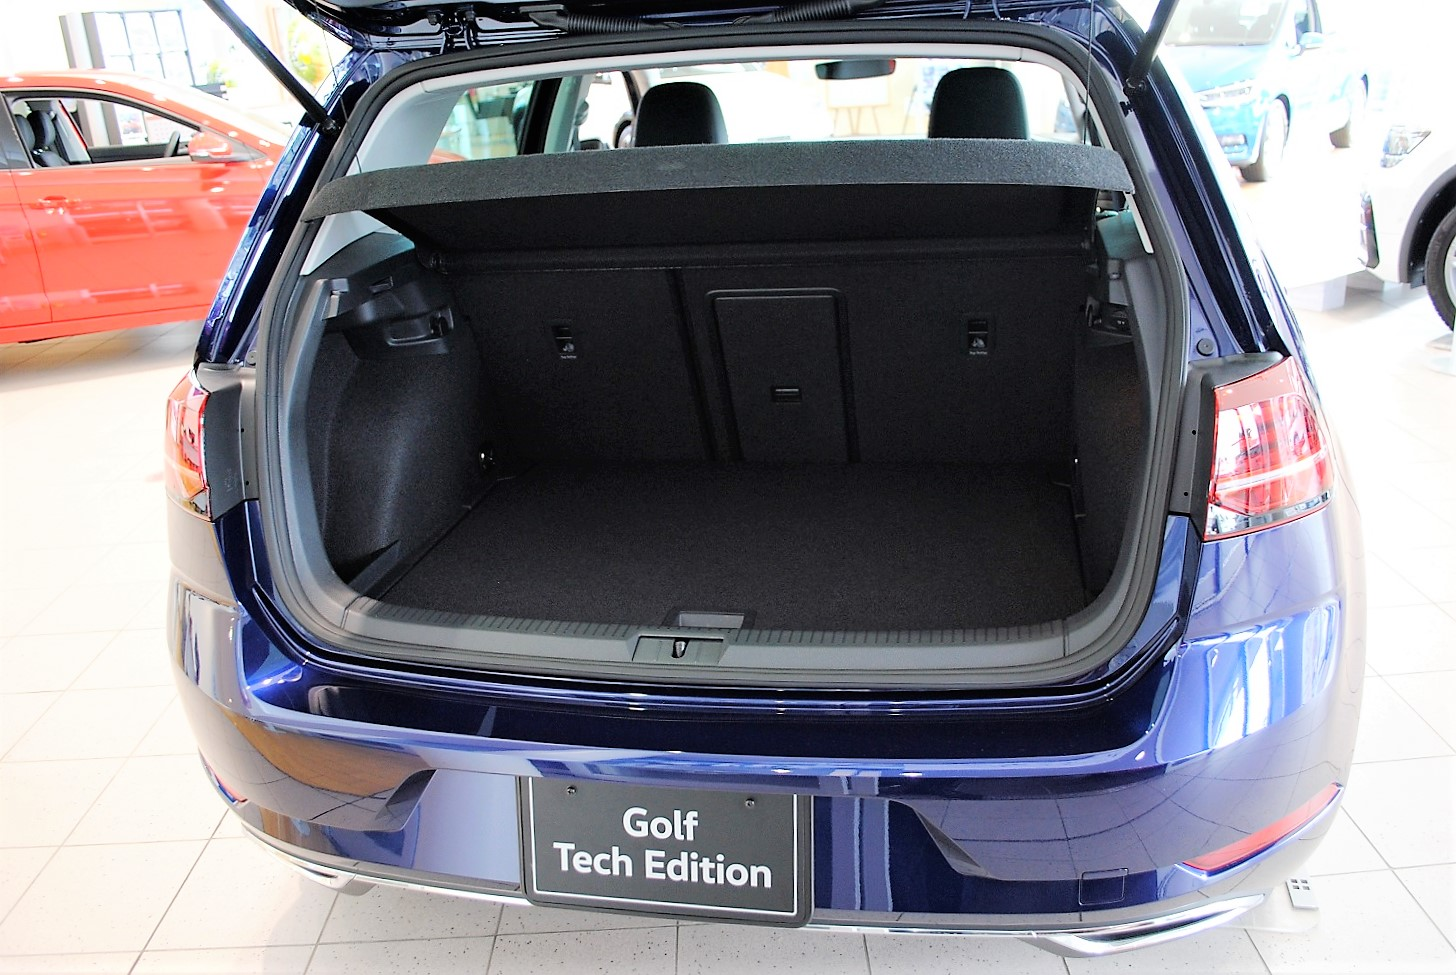 Golf TSI Highline Tech Editionの画像3